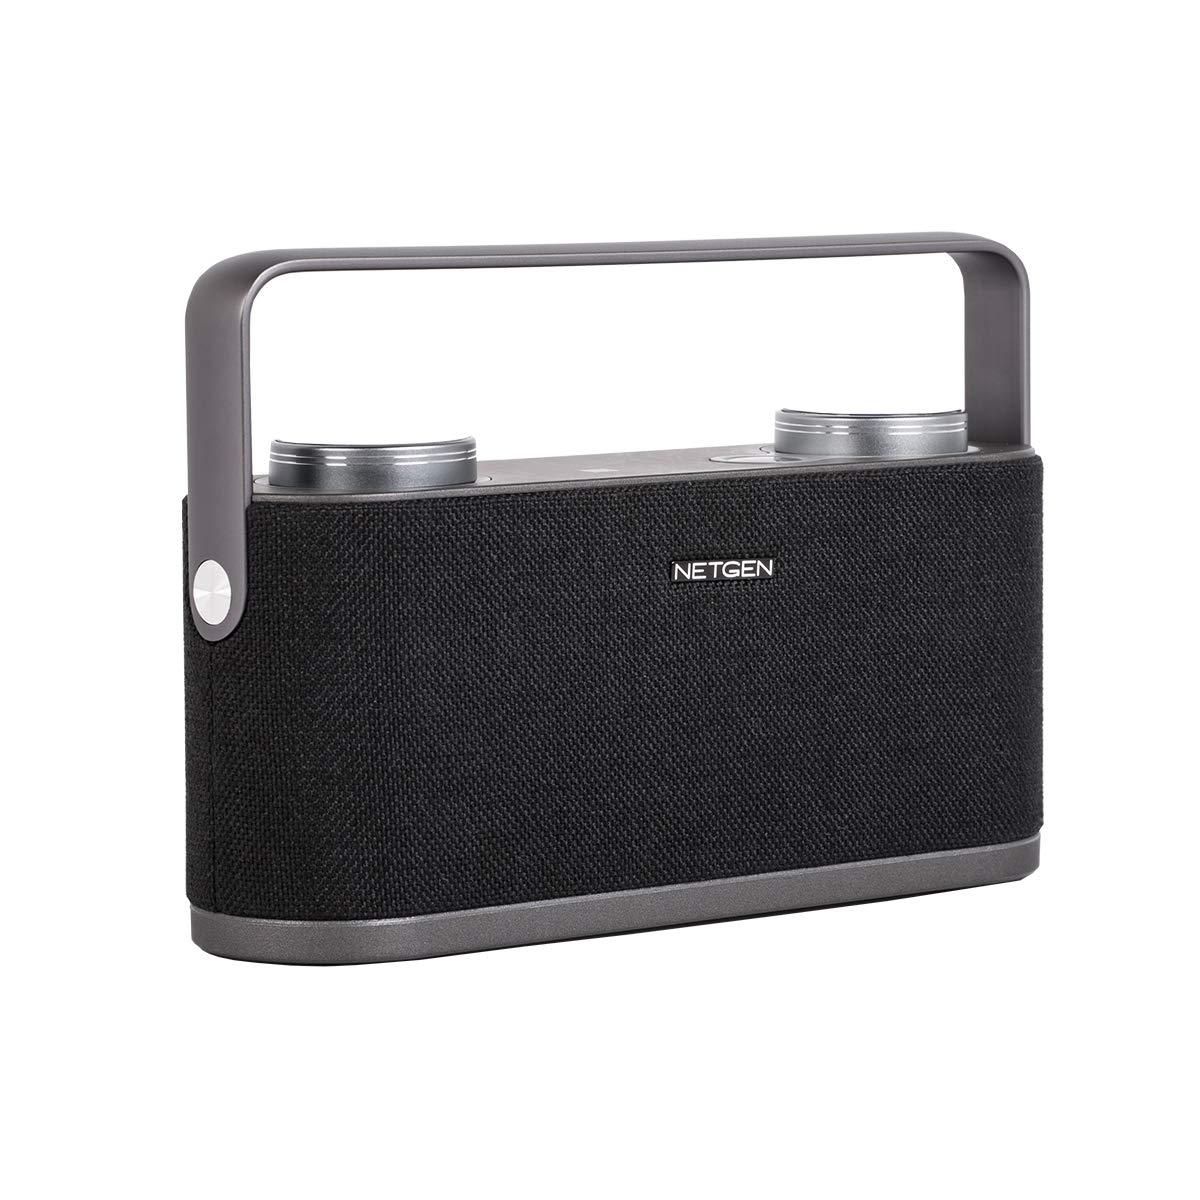 Netgen Bluetooth Speaker with Built-in Mic (Black)